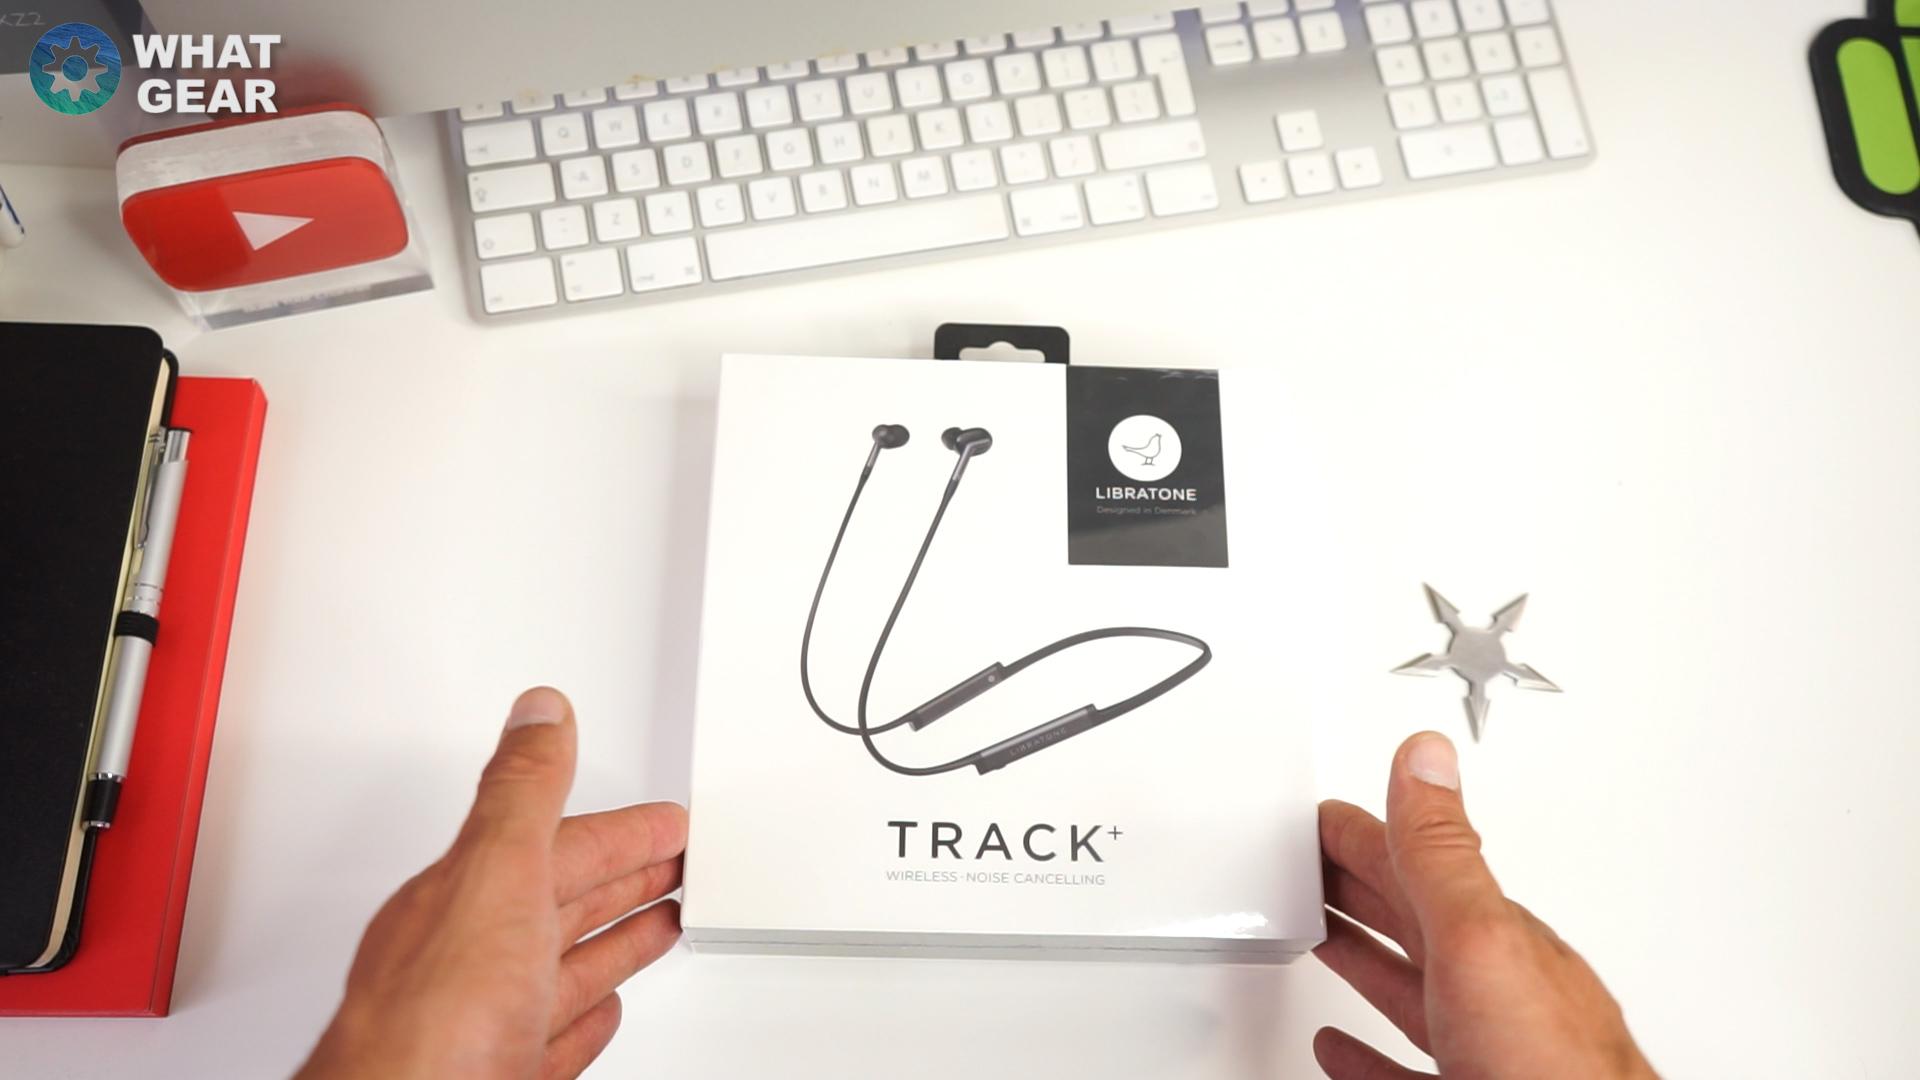 libratone track plus review 1.jpg